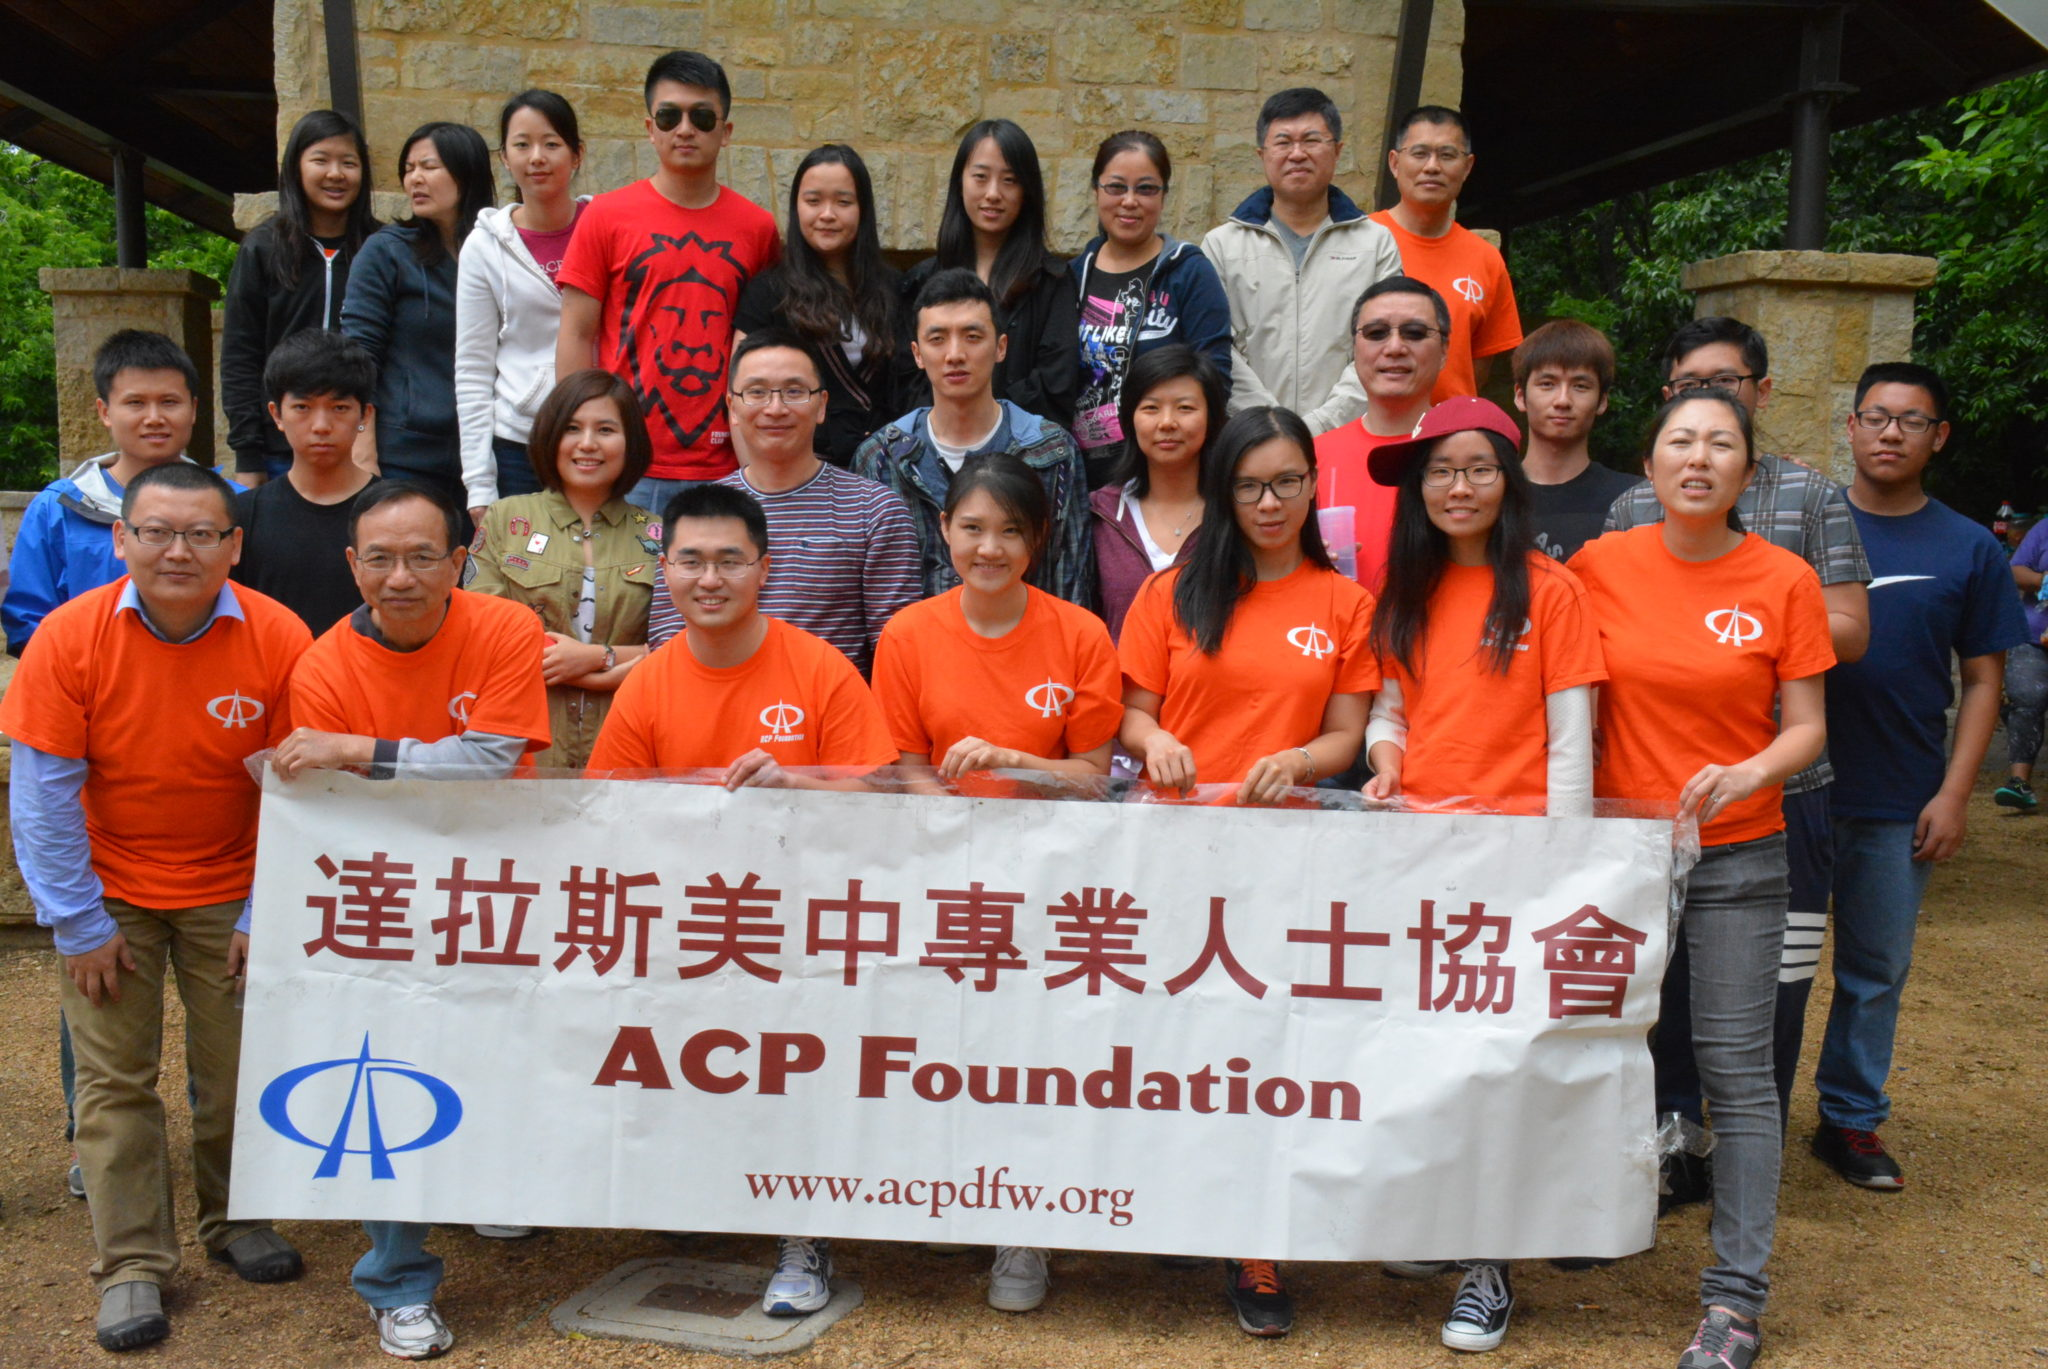 <b>2016年ACP社区BBQ活动</b><br>